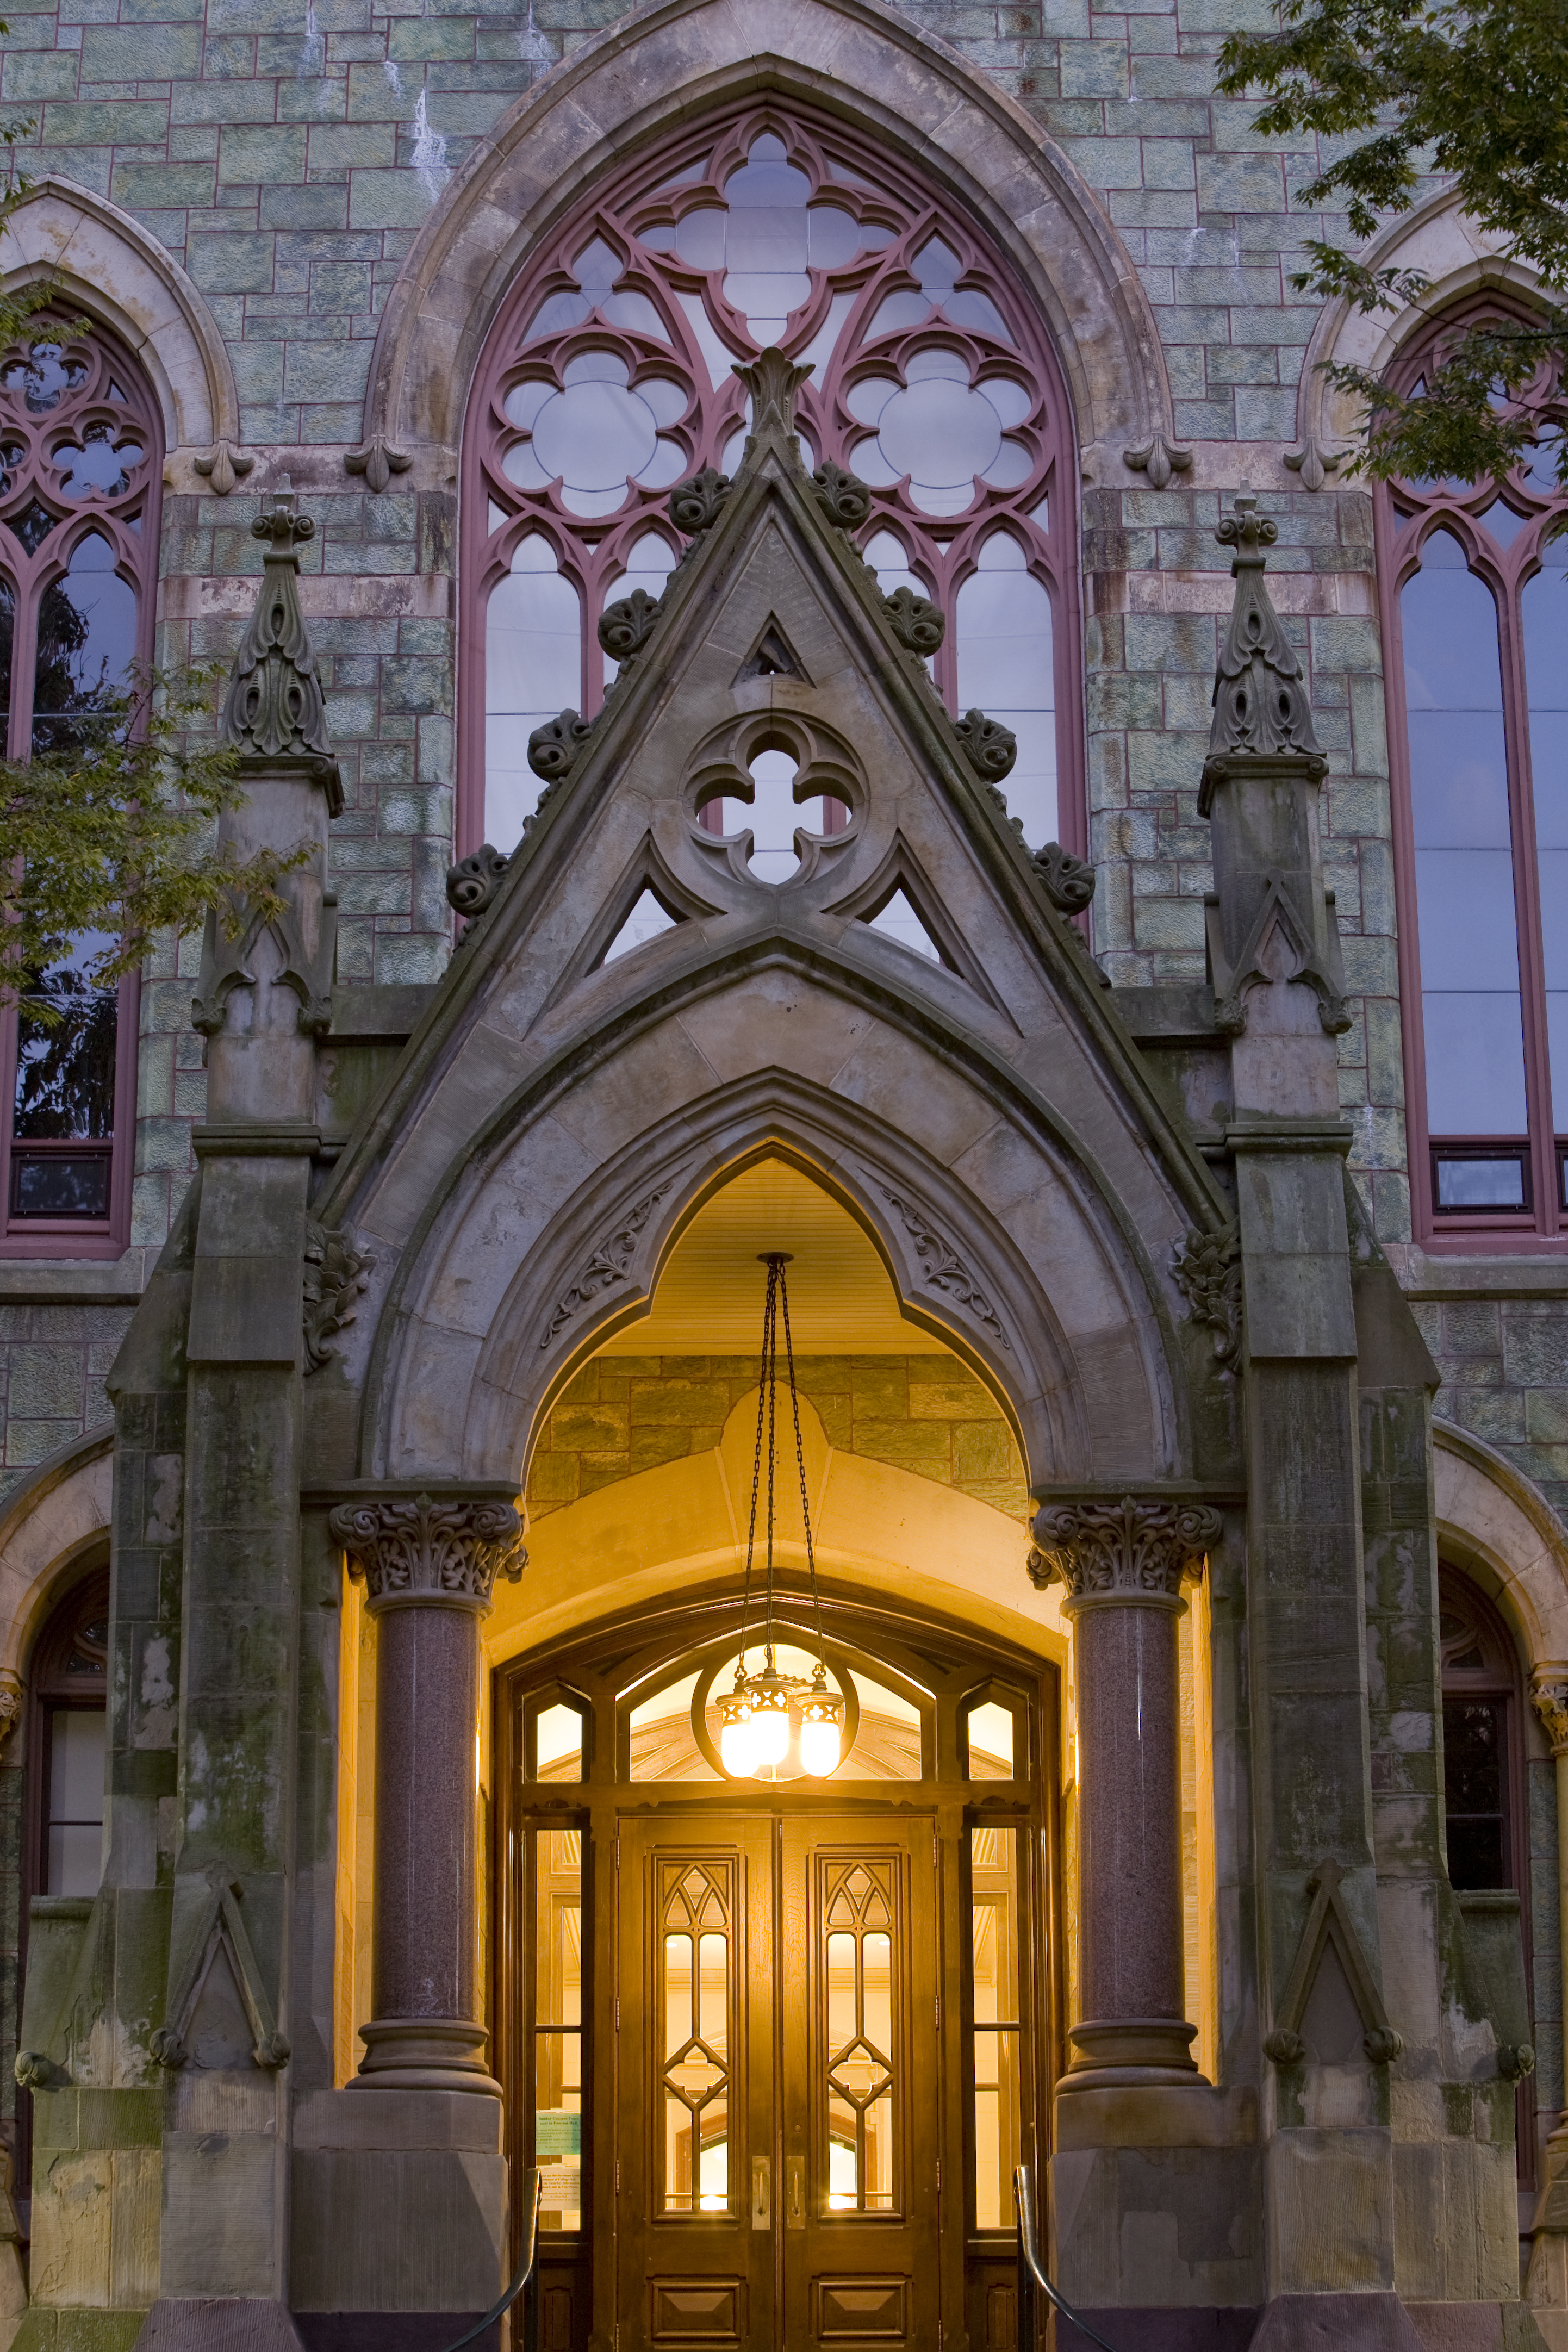 illuminated College Hall entry at dusk